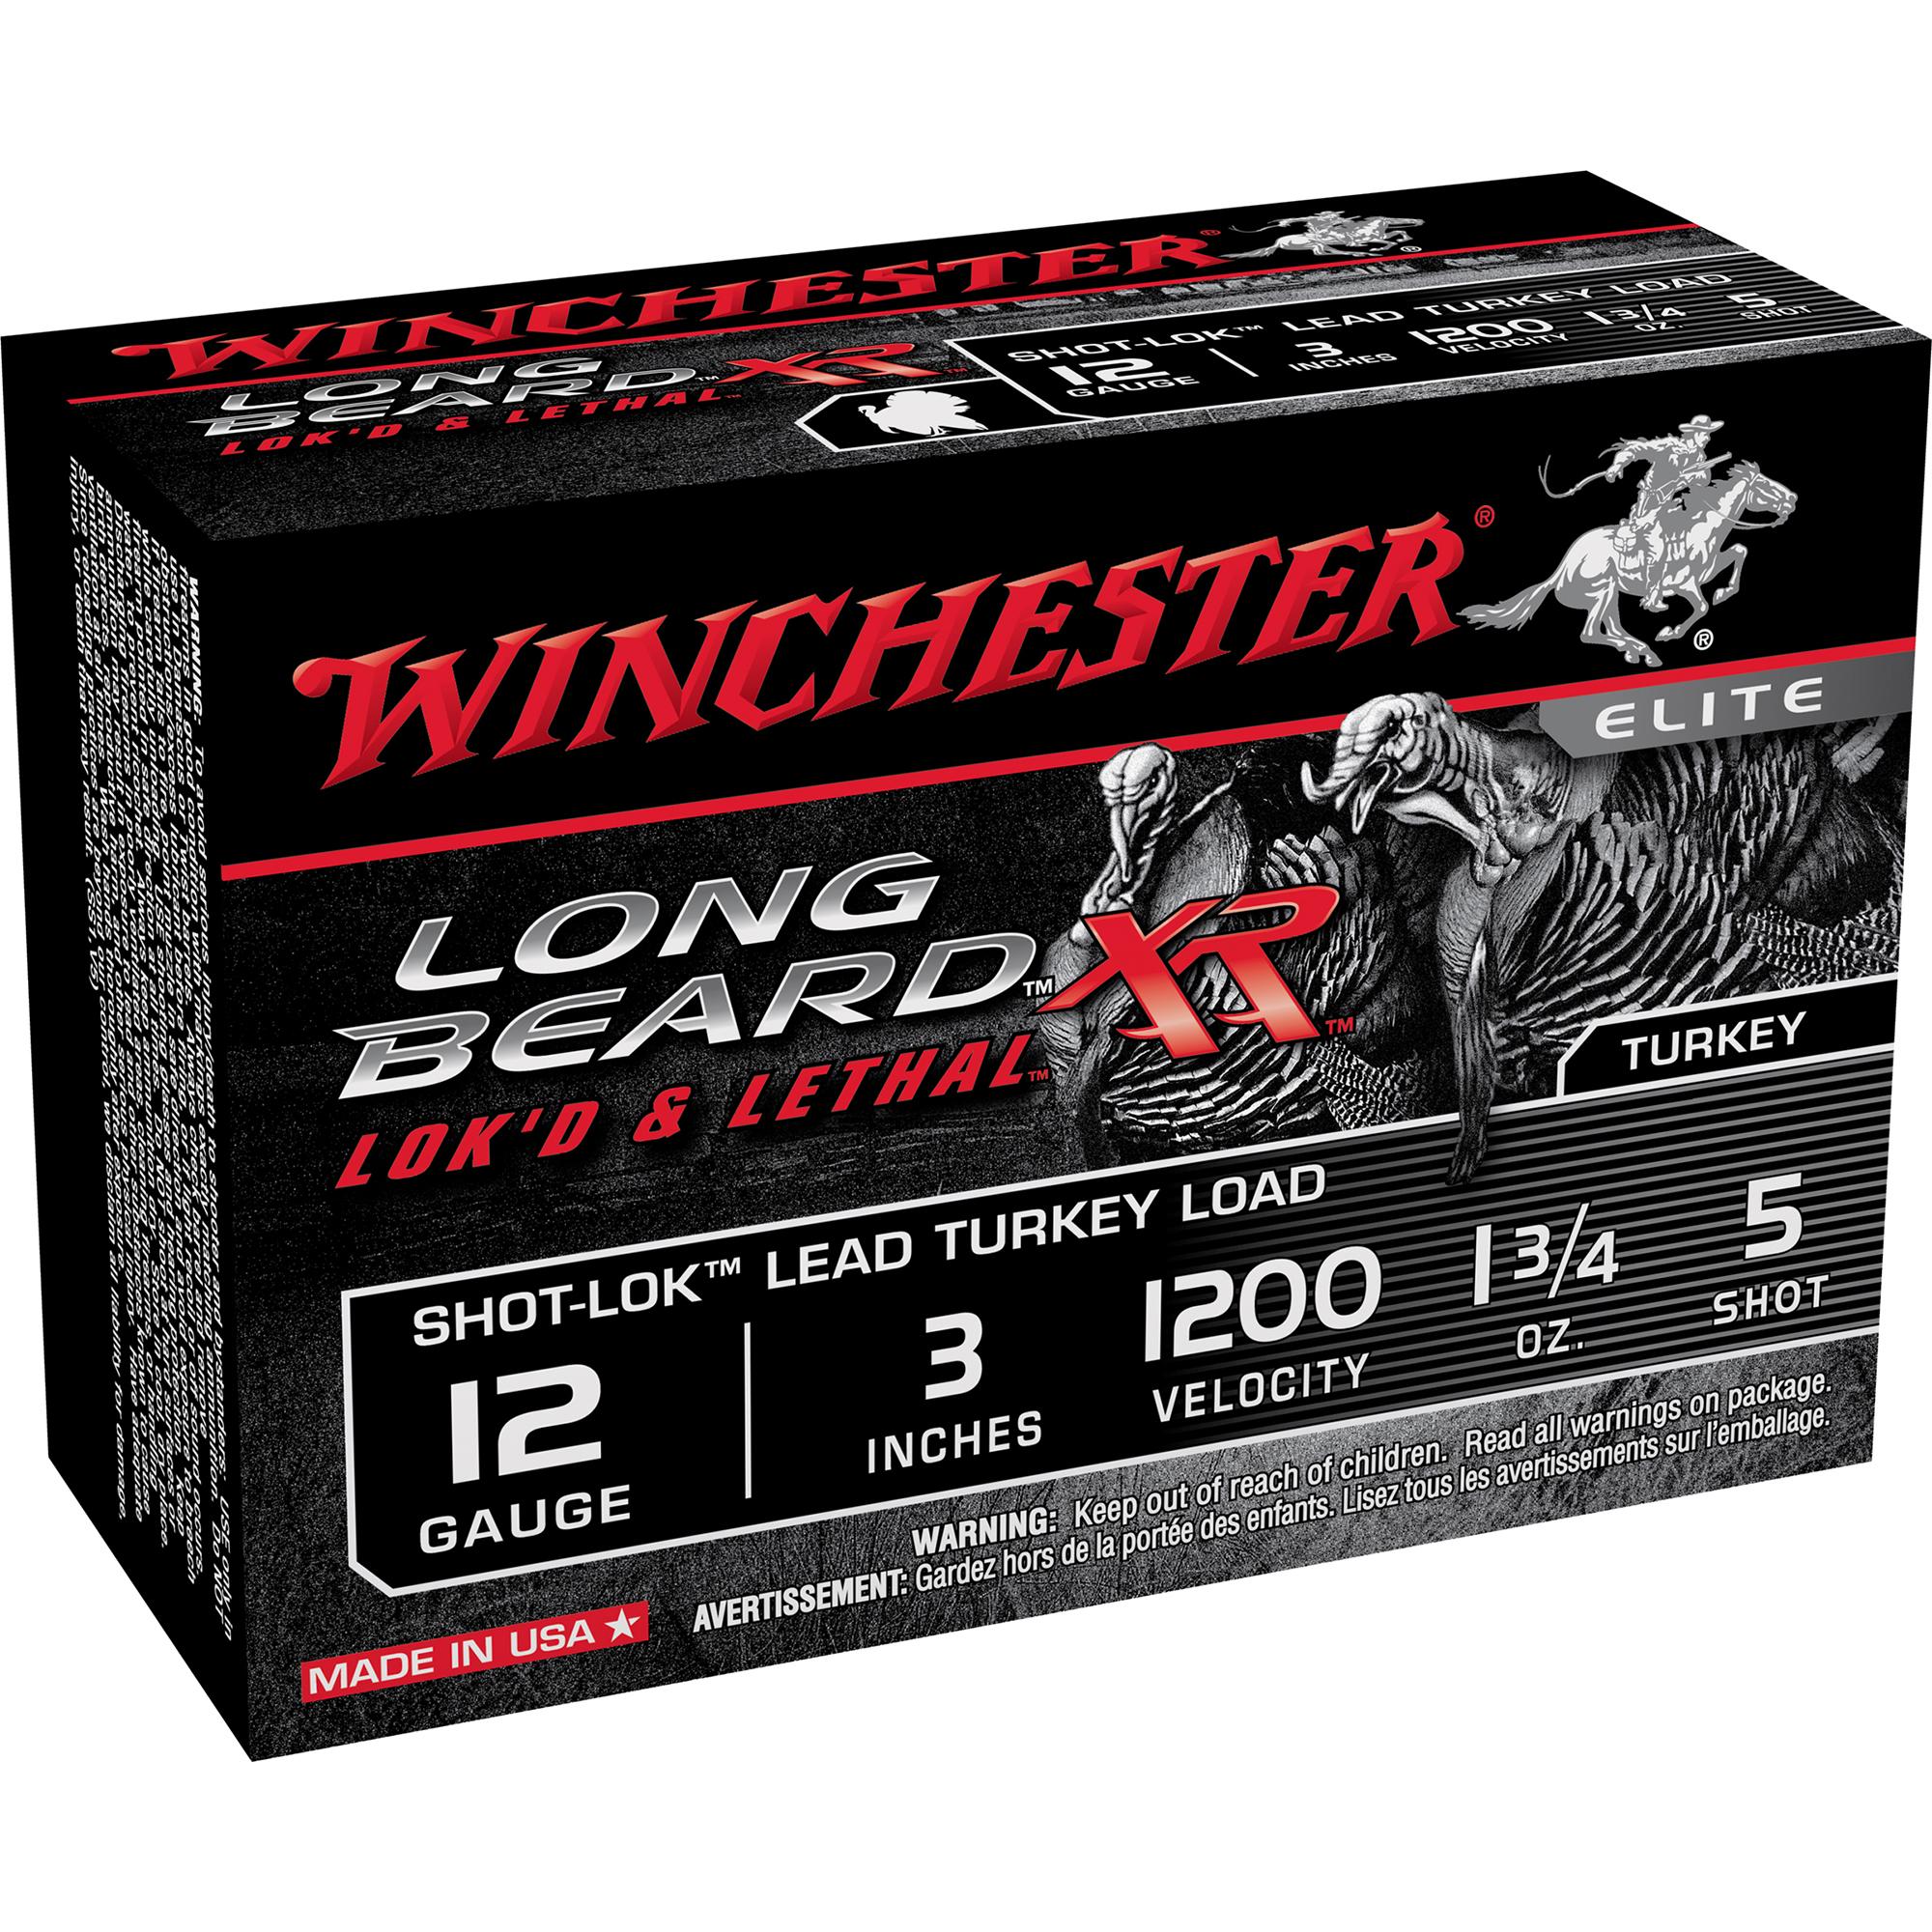 Winchester Long Beard XR Turkey Loads, 12-ga, 3″, 1-3/4 oz, #5